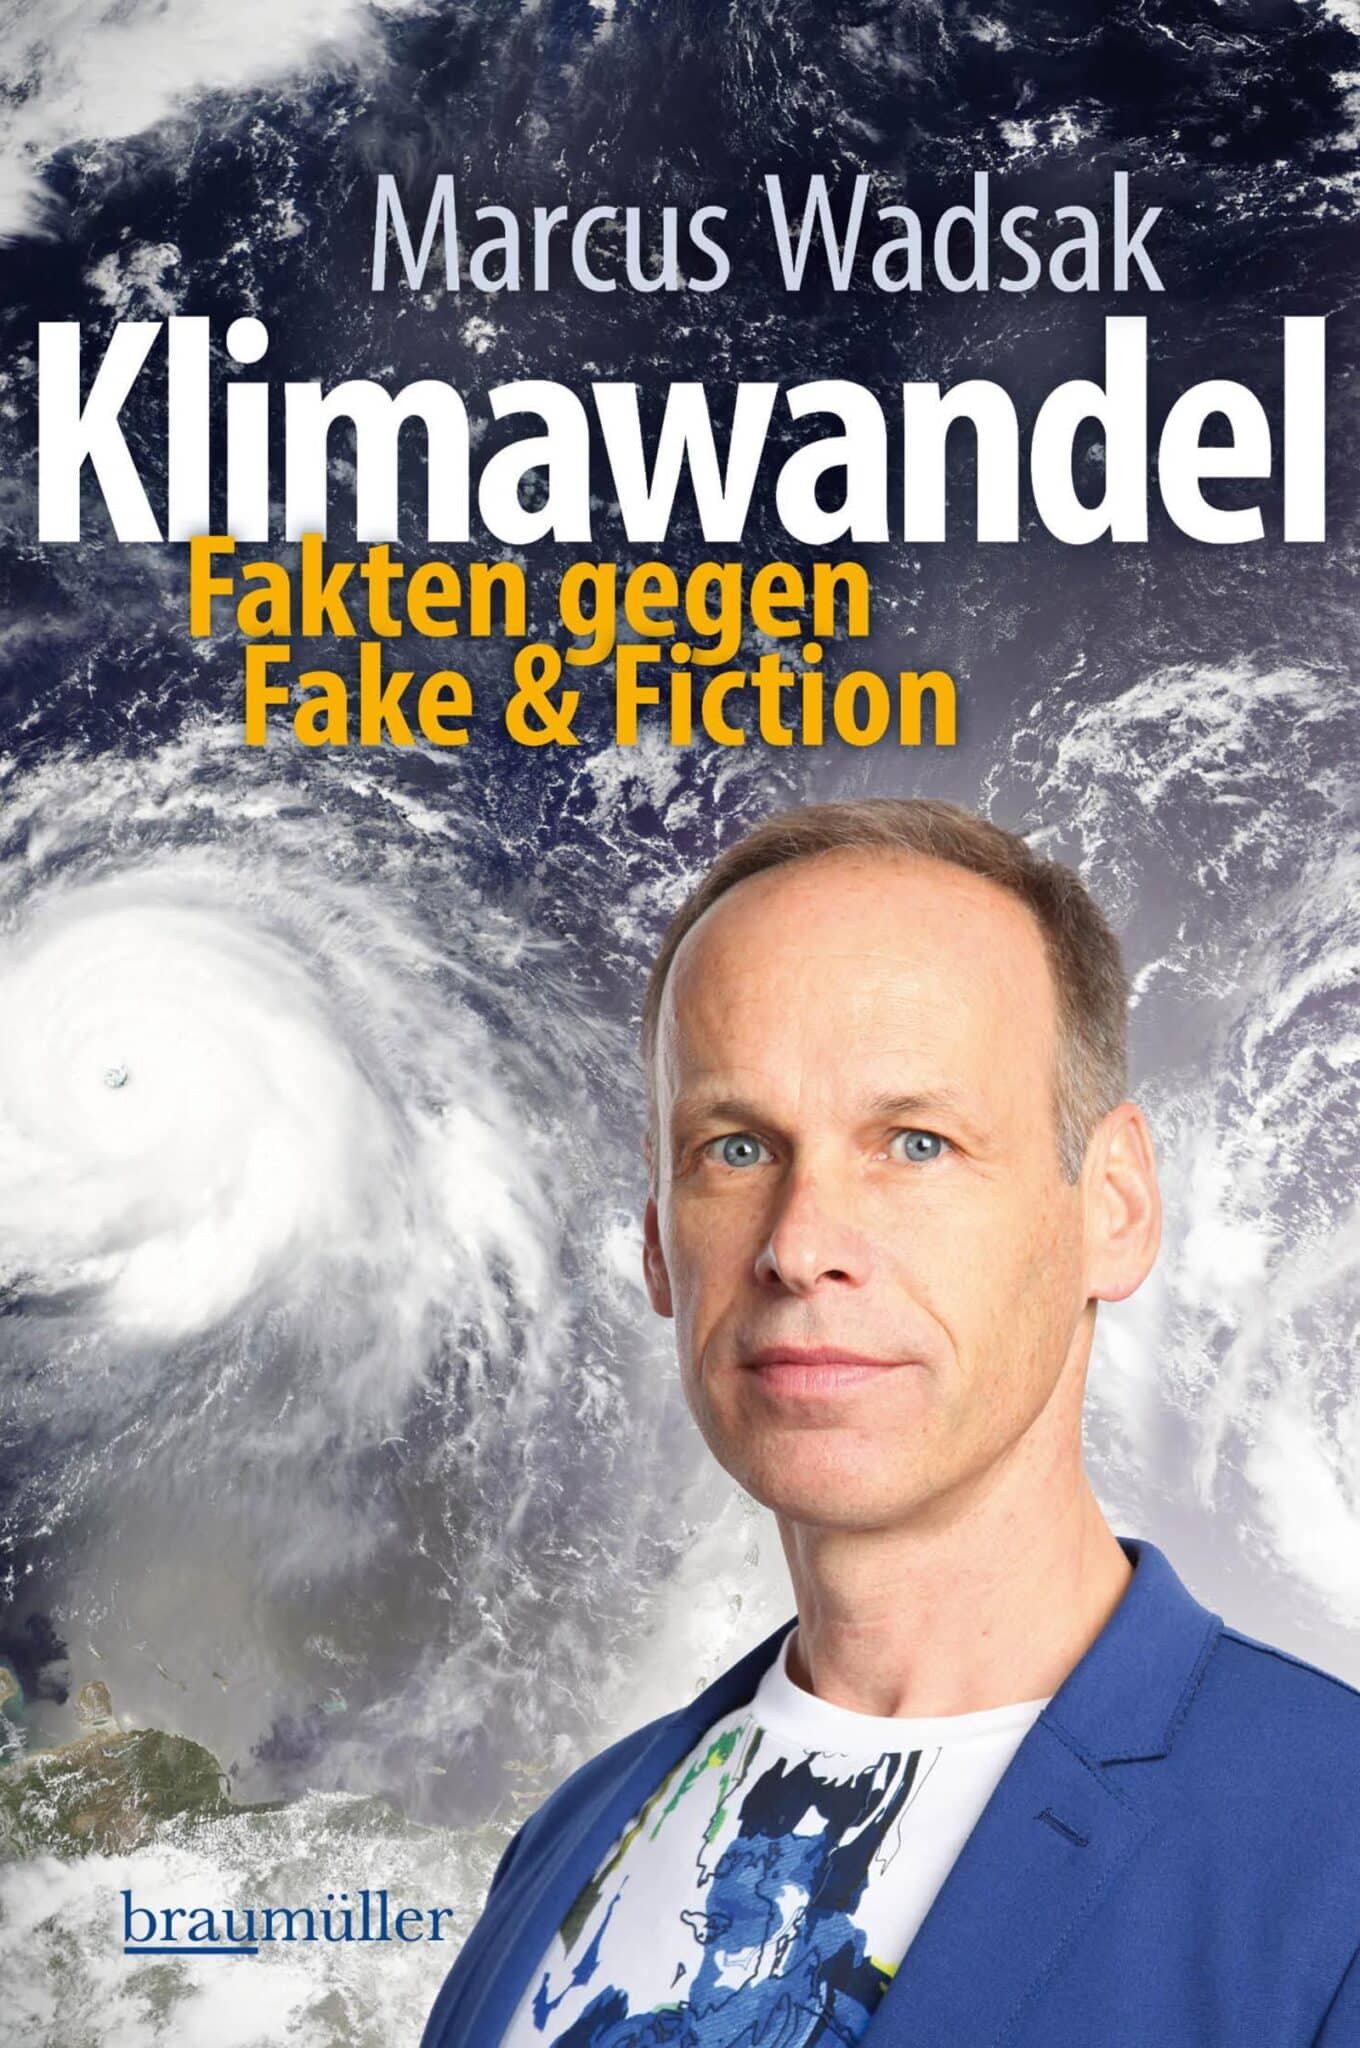 eMobility - Livestream - Klimawandel | Buch Cover Marcus Wadsak scaled